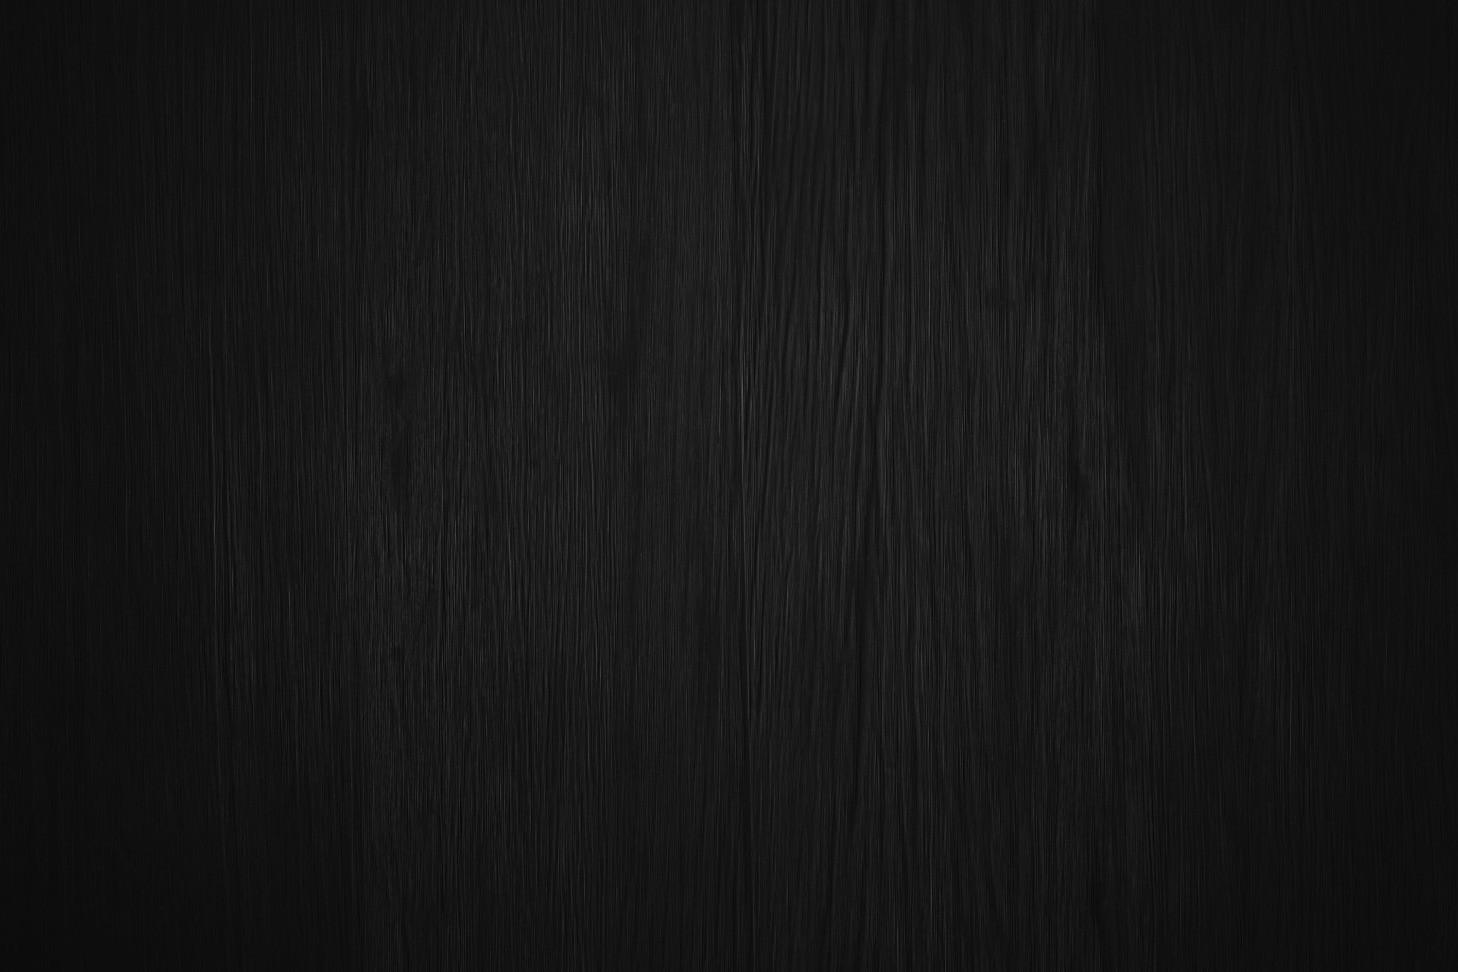 Wood%2520Black%2520background%2520textur